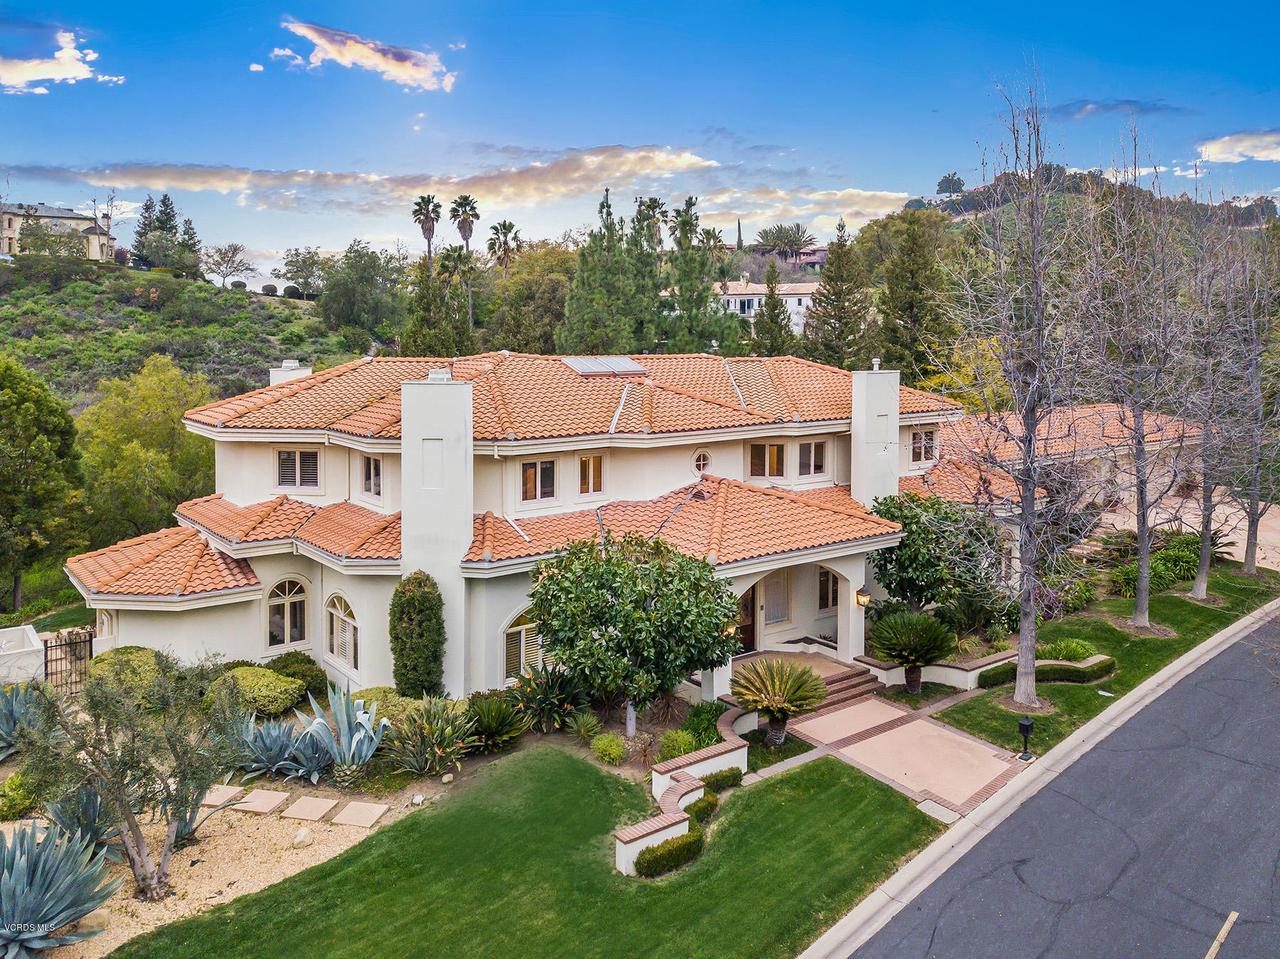 735 COUNTRY VALLEY, Westlake Village, CA 91362 - 2